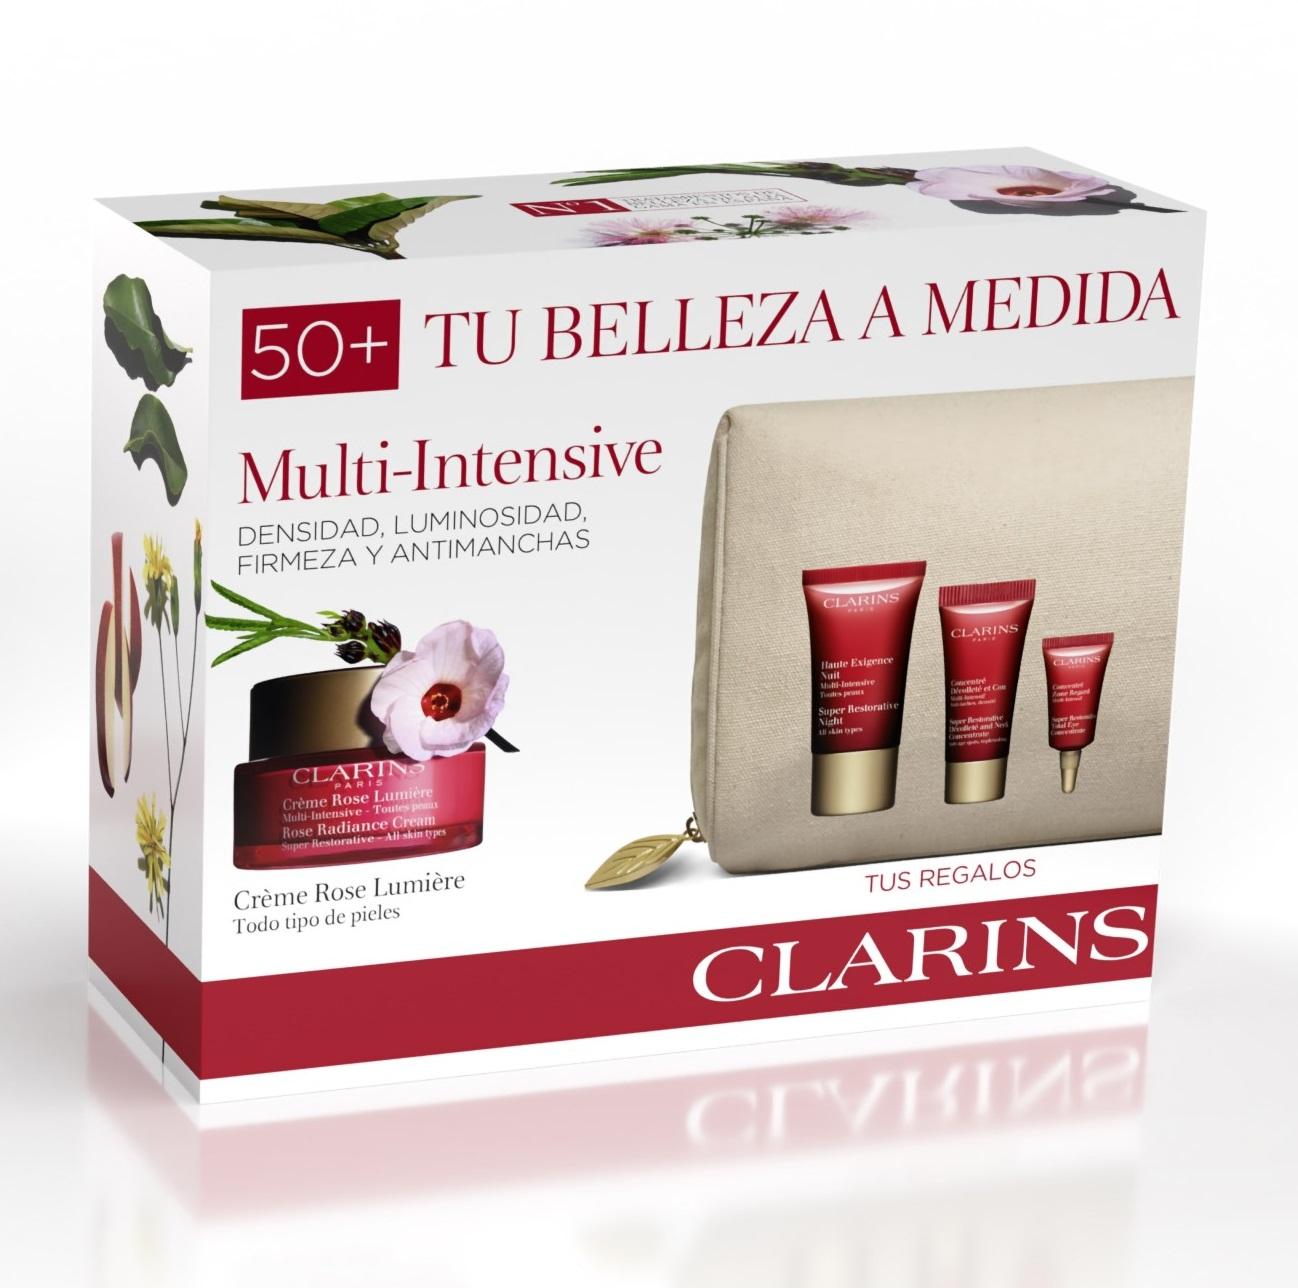 Clarins Crème Rose Lumière Estuche  Multi-Intensiva